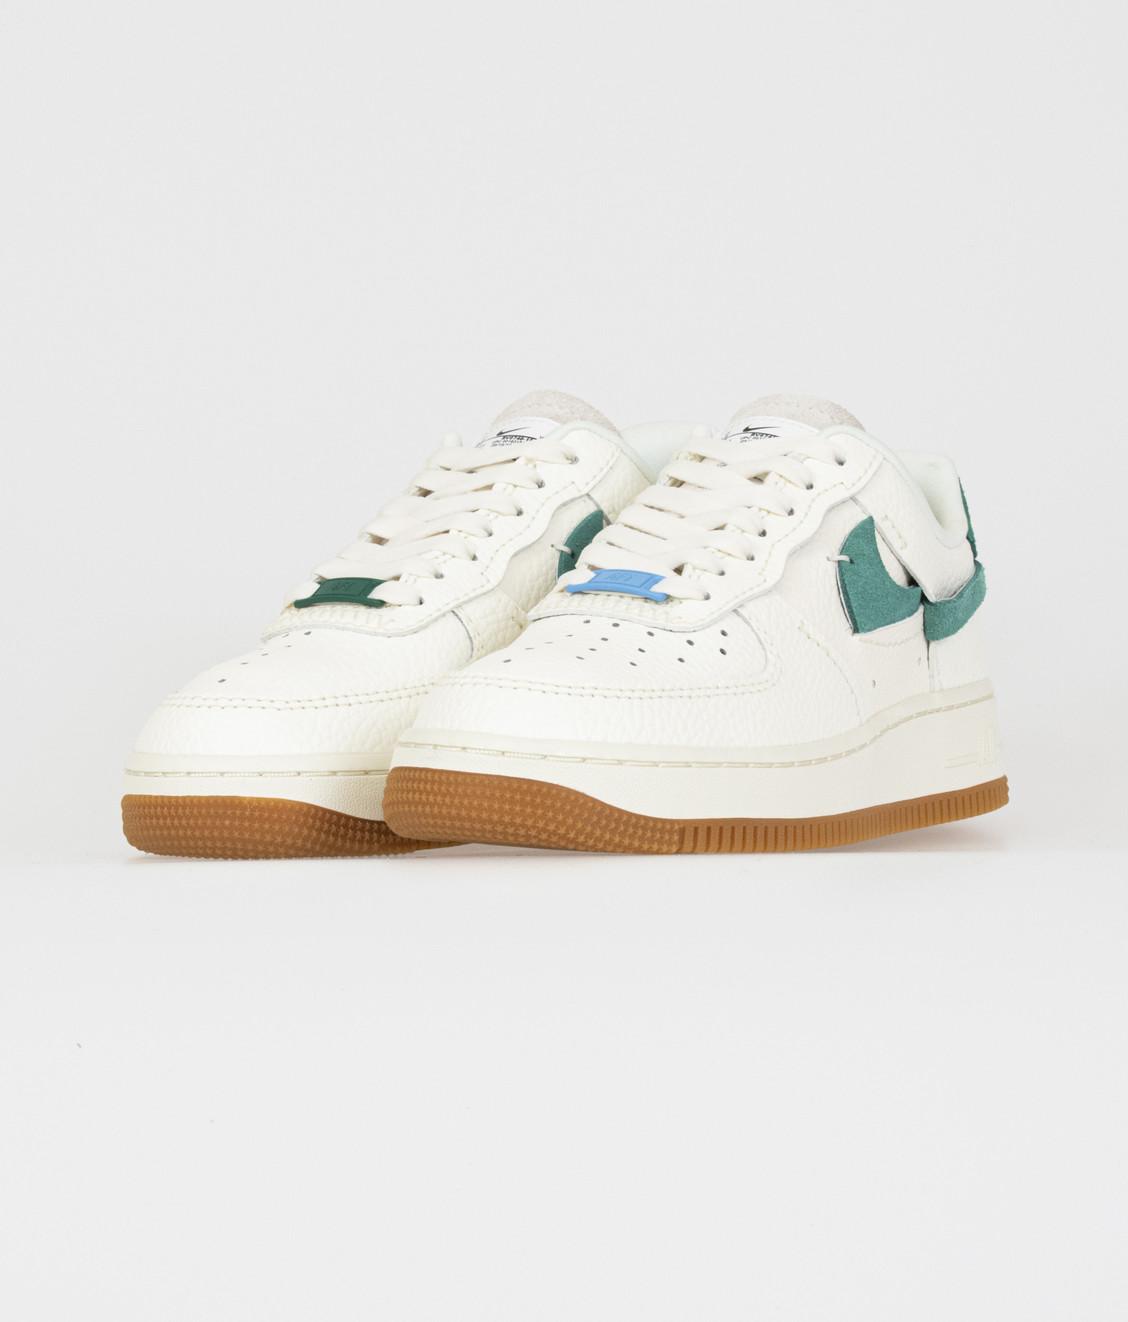 Nike Nike W Air Force 1 07 LXX Mystic Green/Light Blue